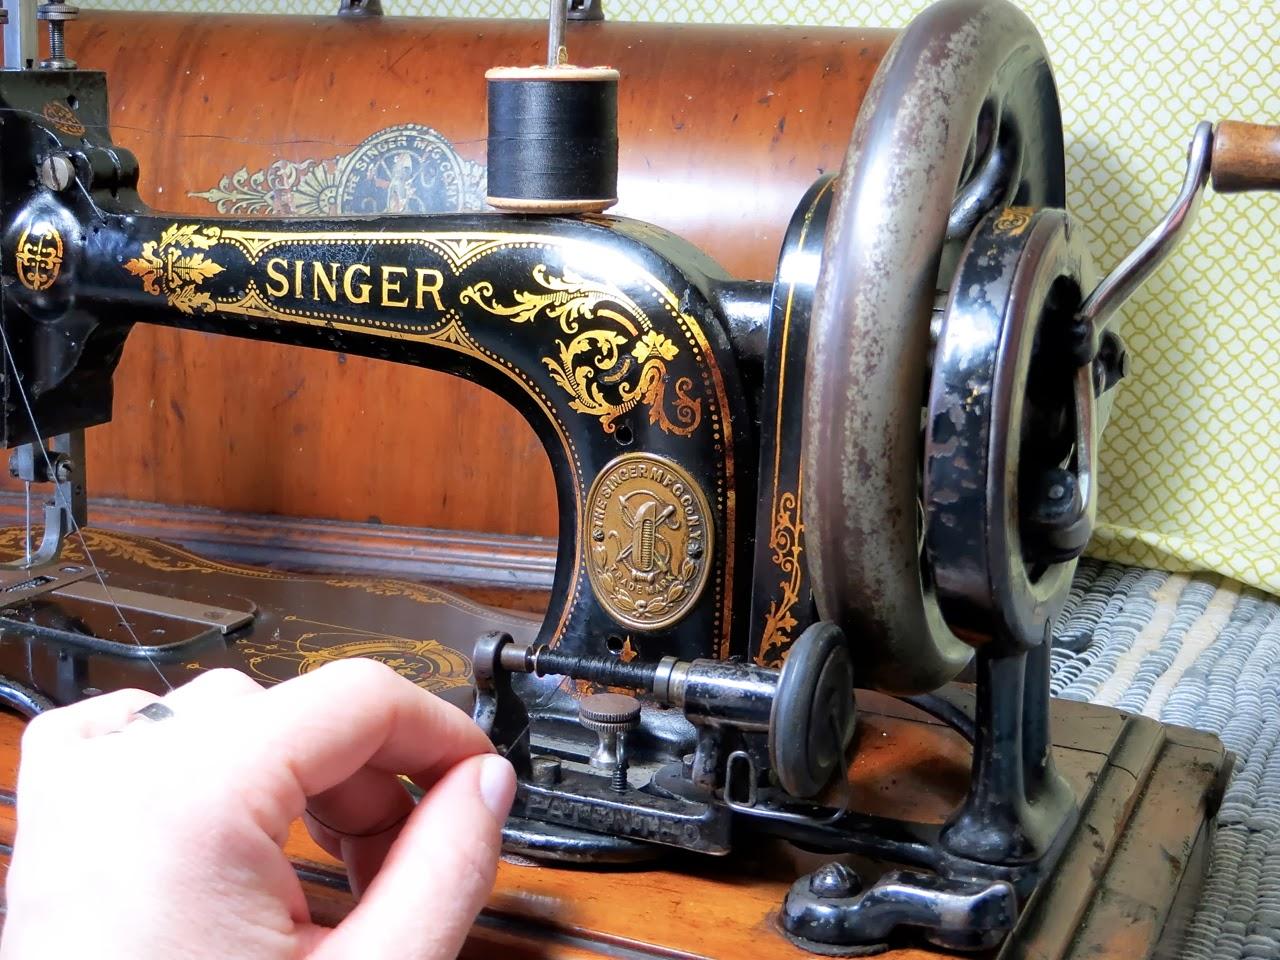 The Project Lady - Singer Model 12 Fiddlebase Handcrank